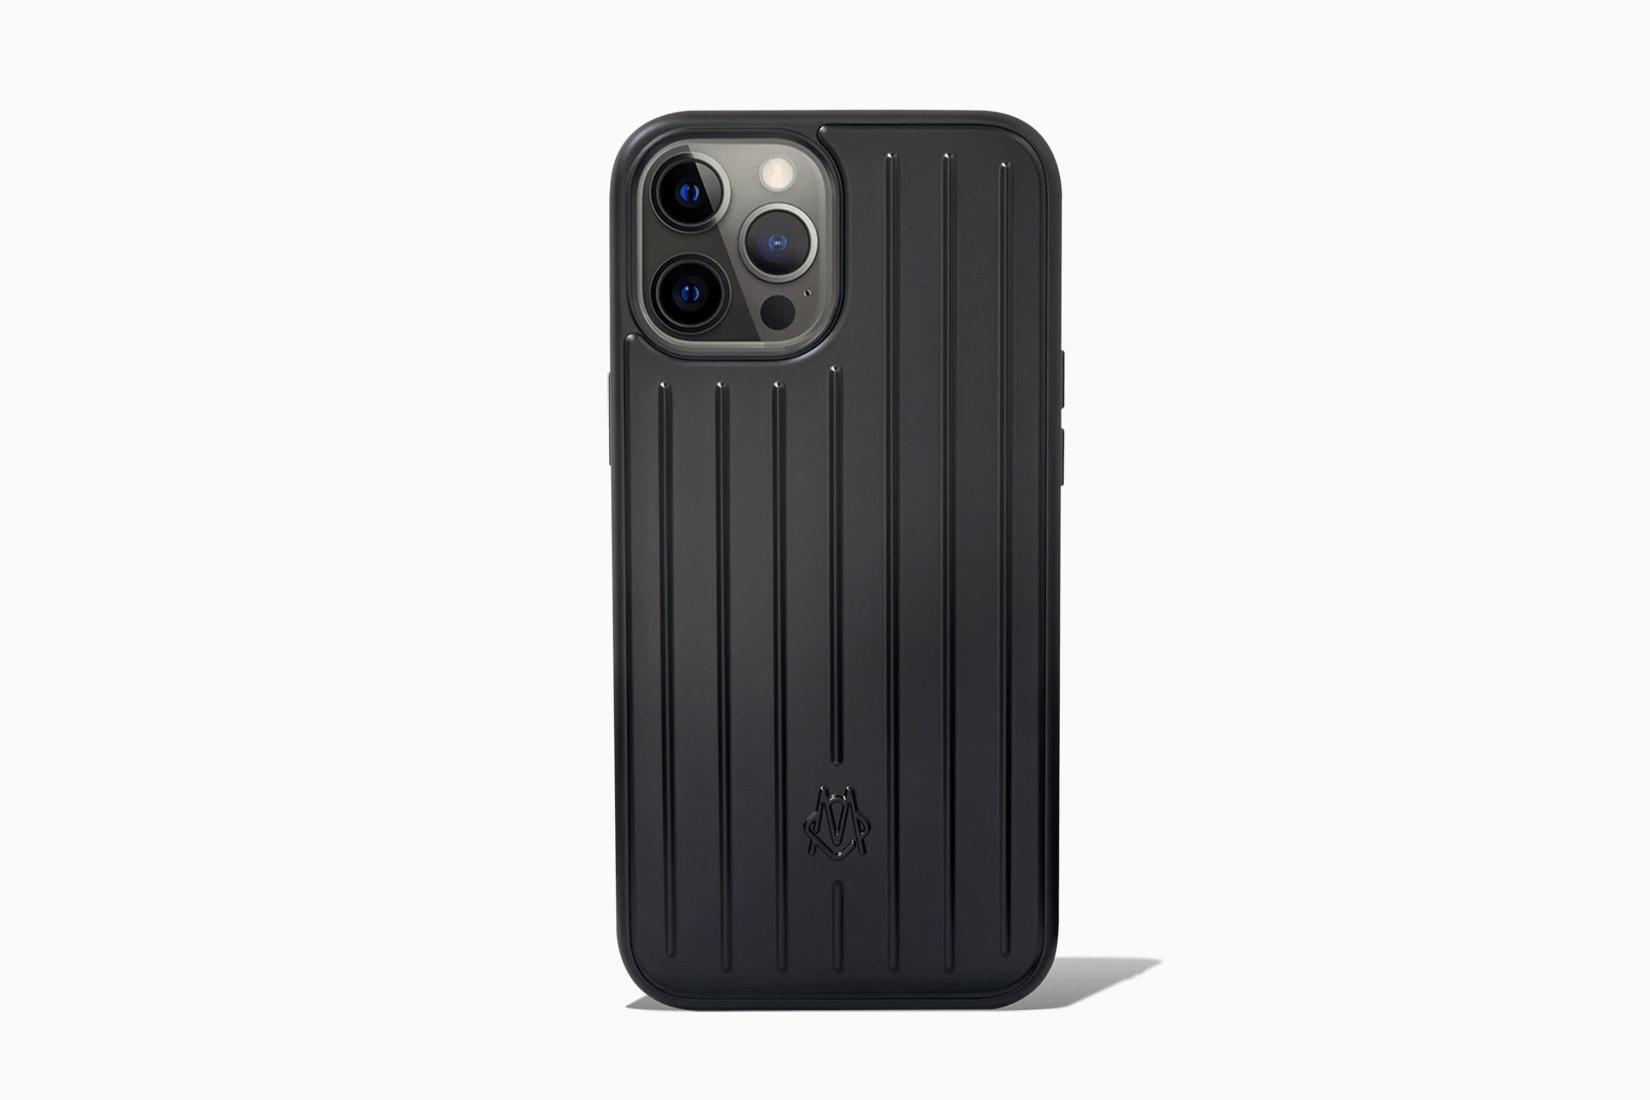 best iphone case premium rimowa review - Luxe Digital